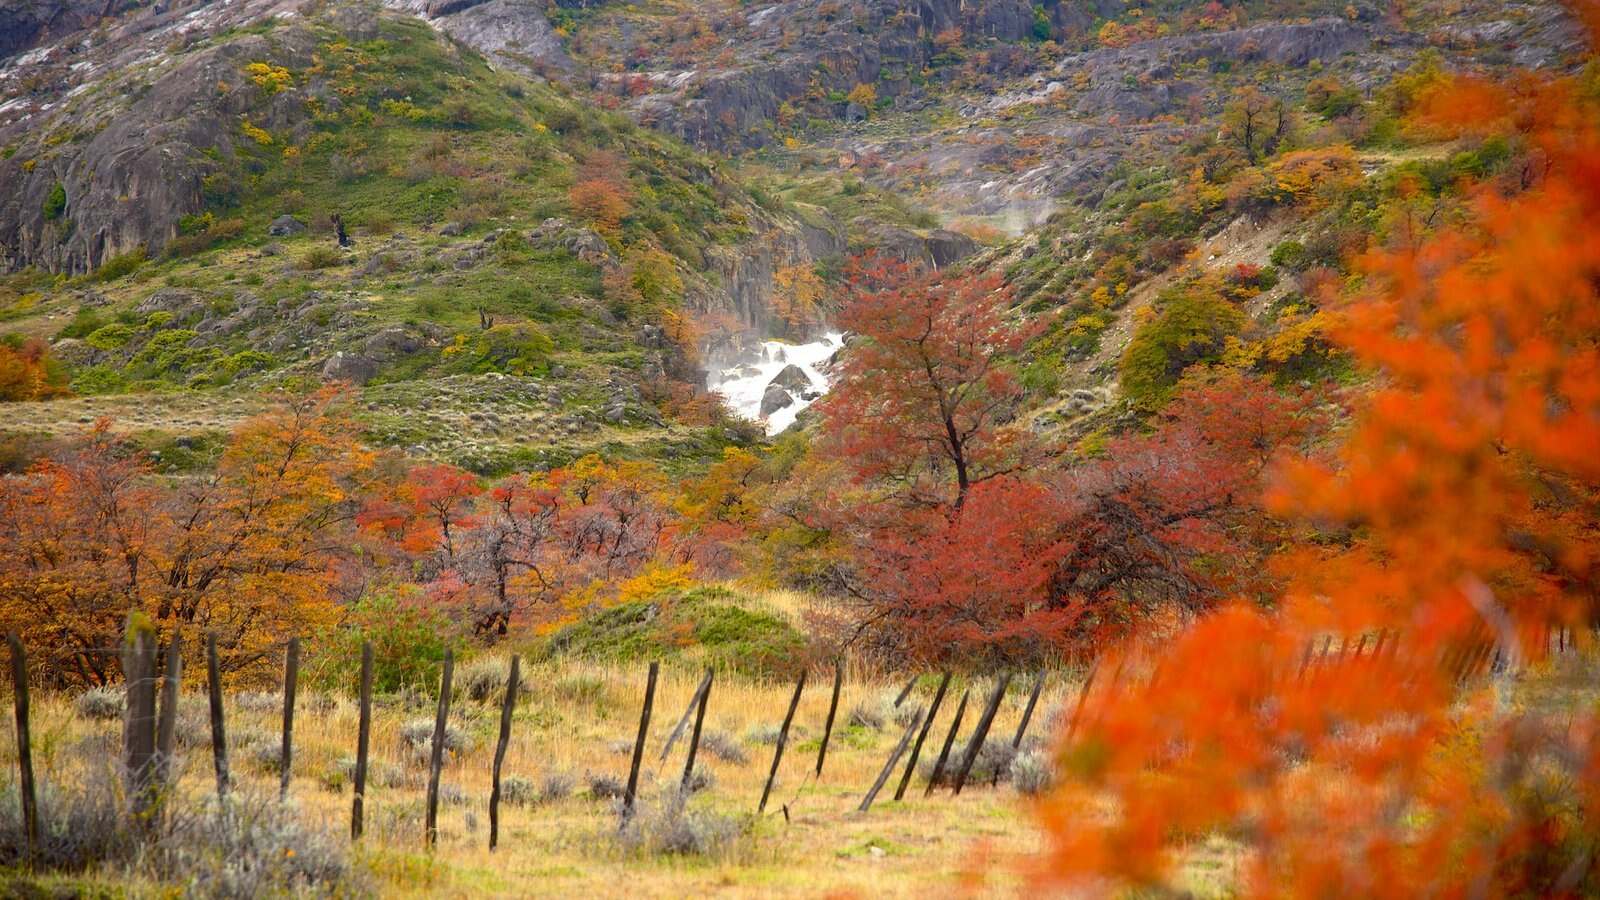 El Calafate caracterizando cenas tranquilas e cores do outono